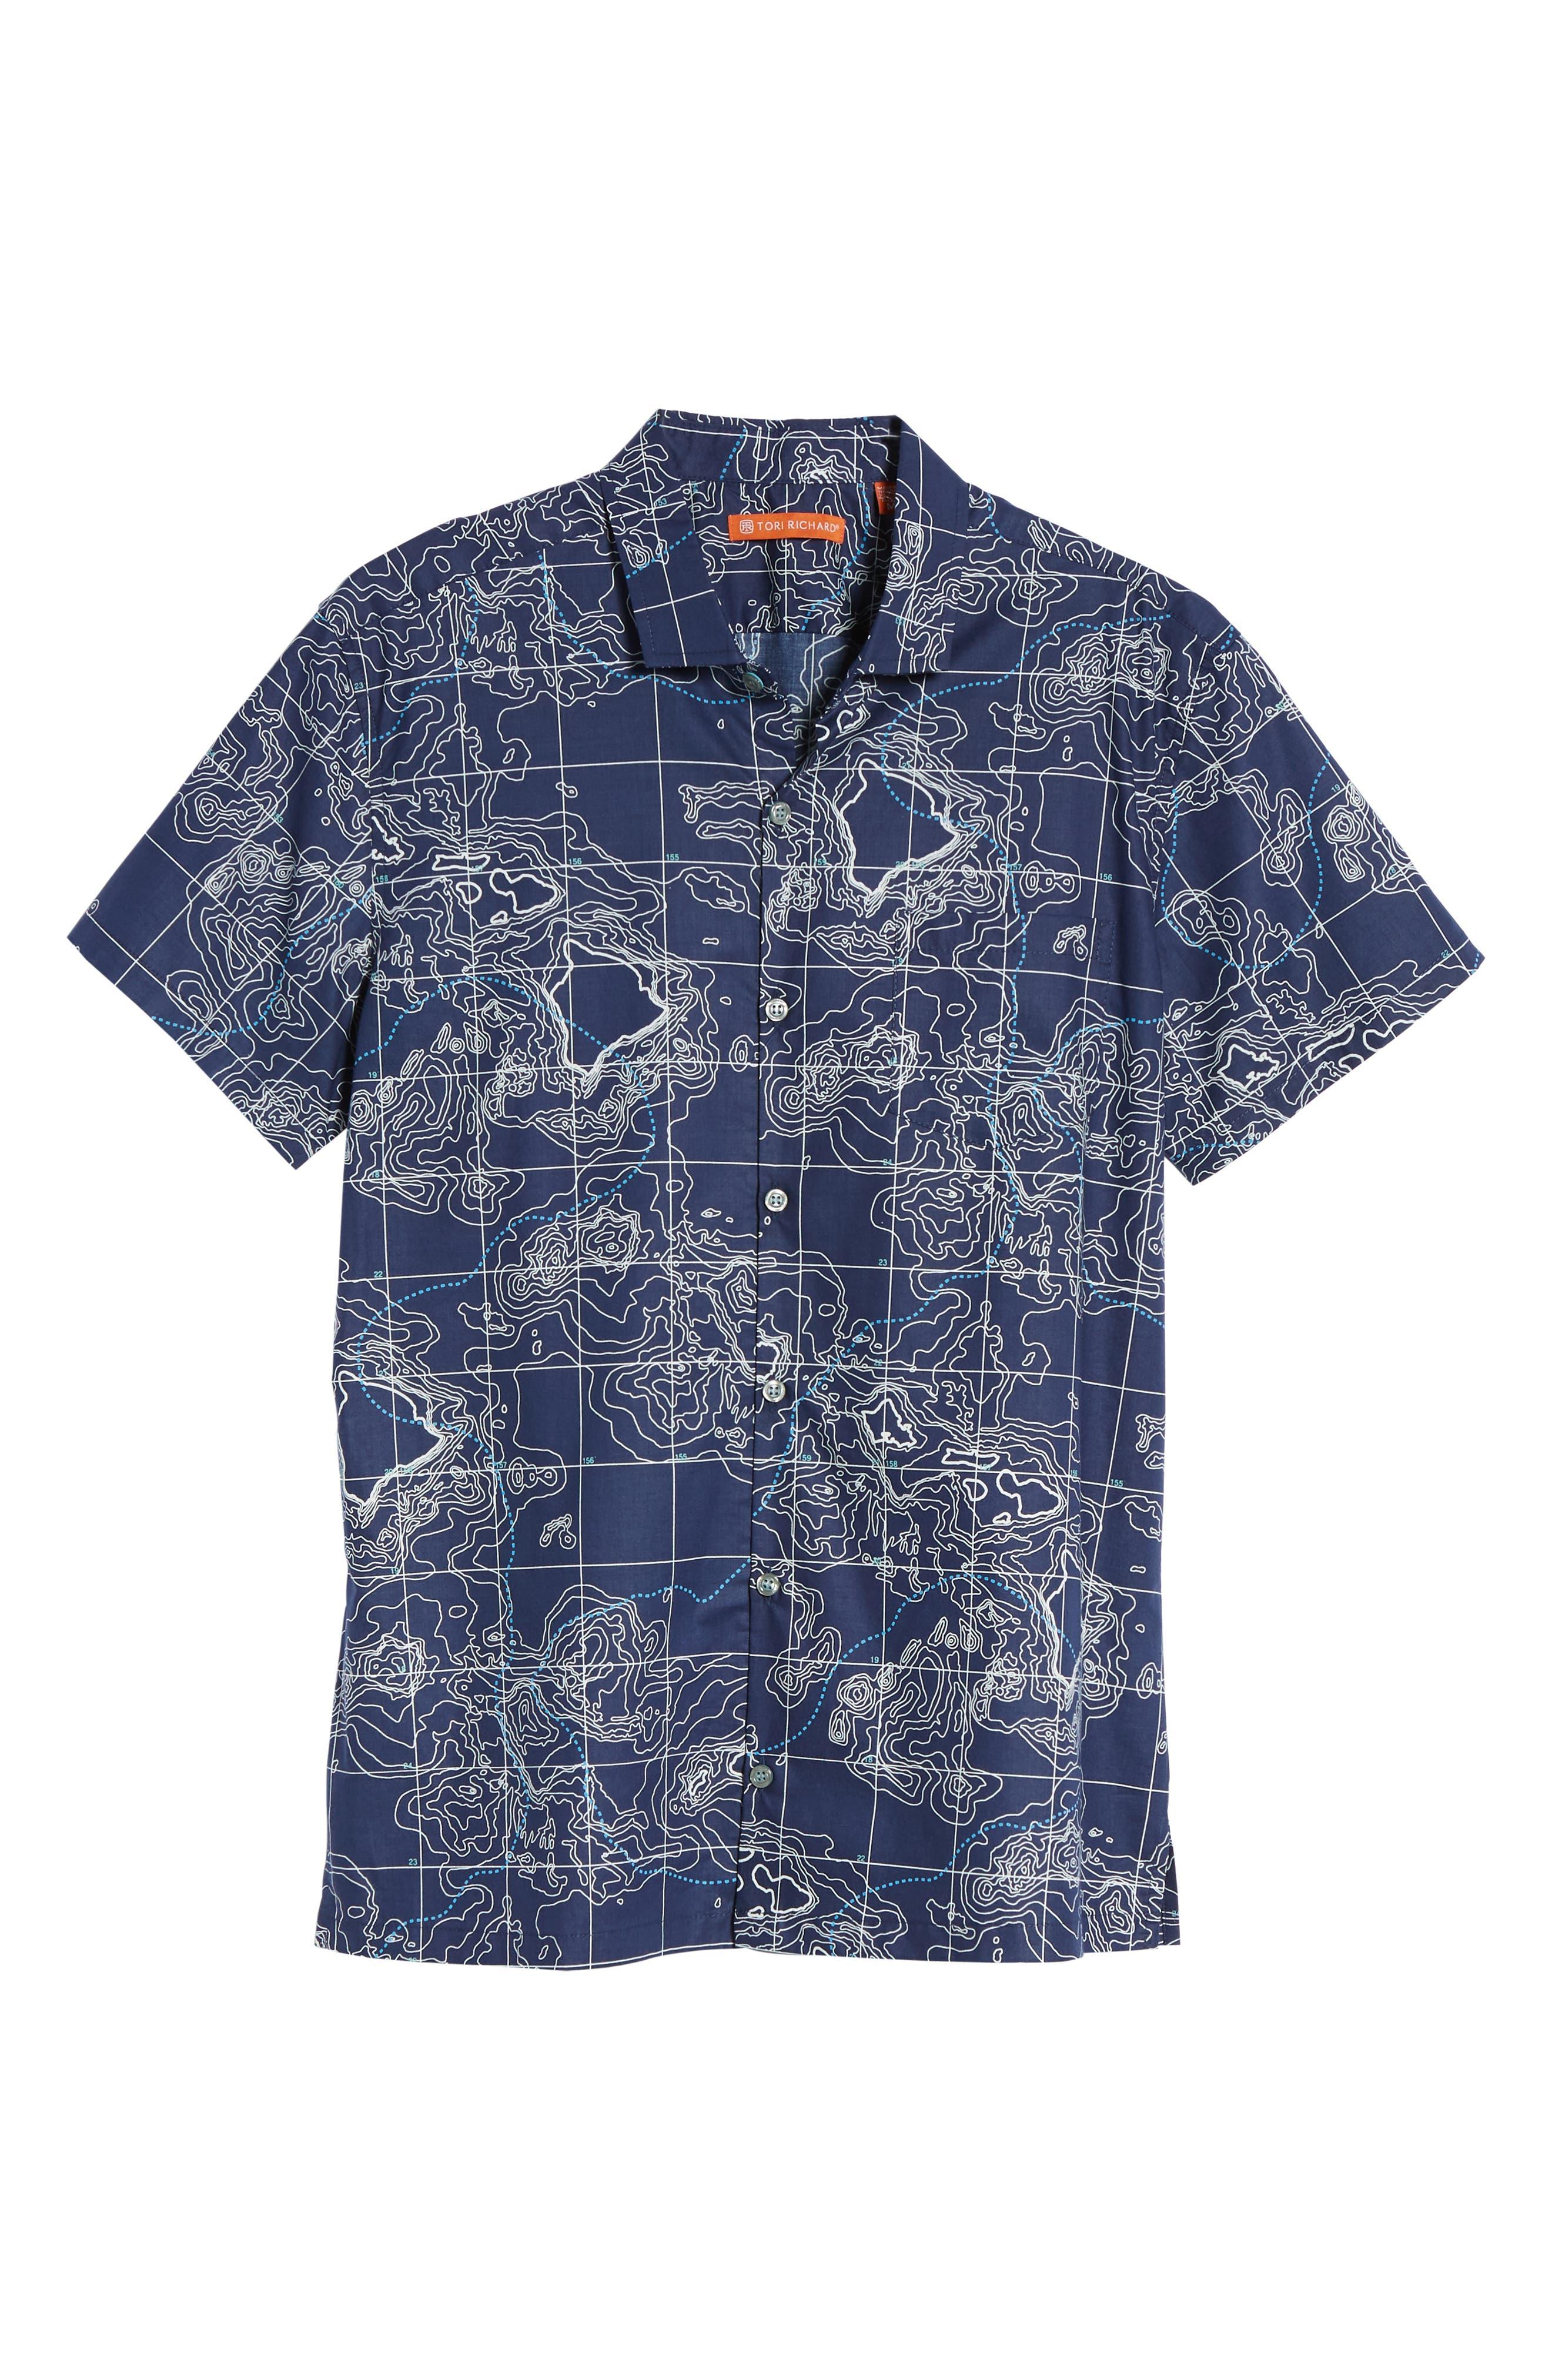 21N 158W Trim Fit Camp Shirt,                             Alternate thumbnail 6, color,                             NAVY